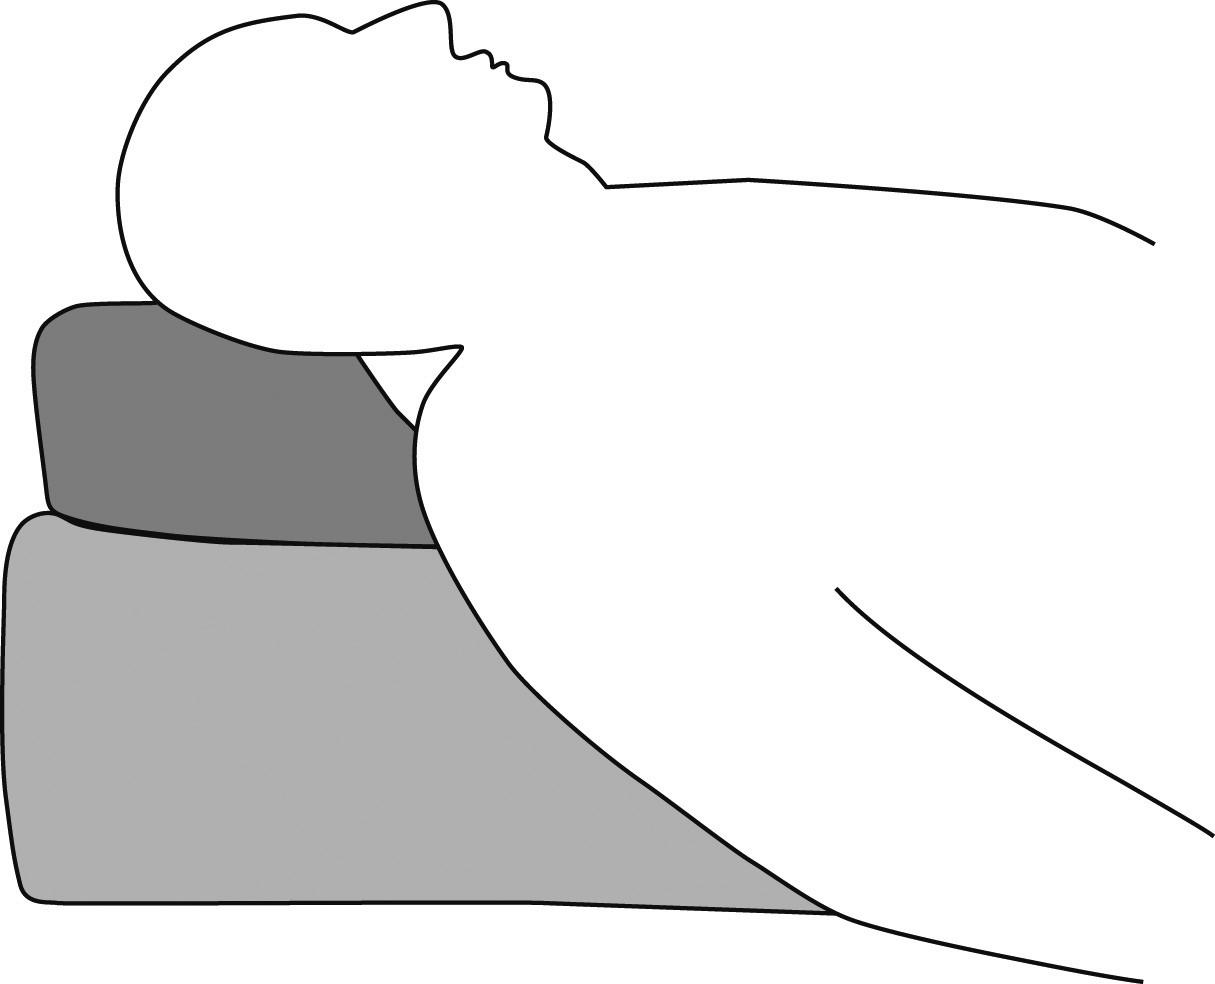 Tzv. ramping position